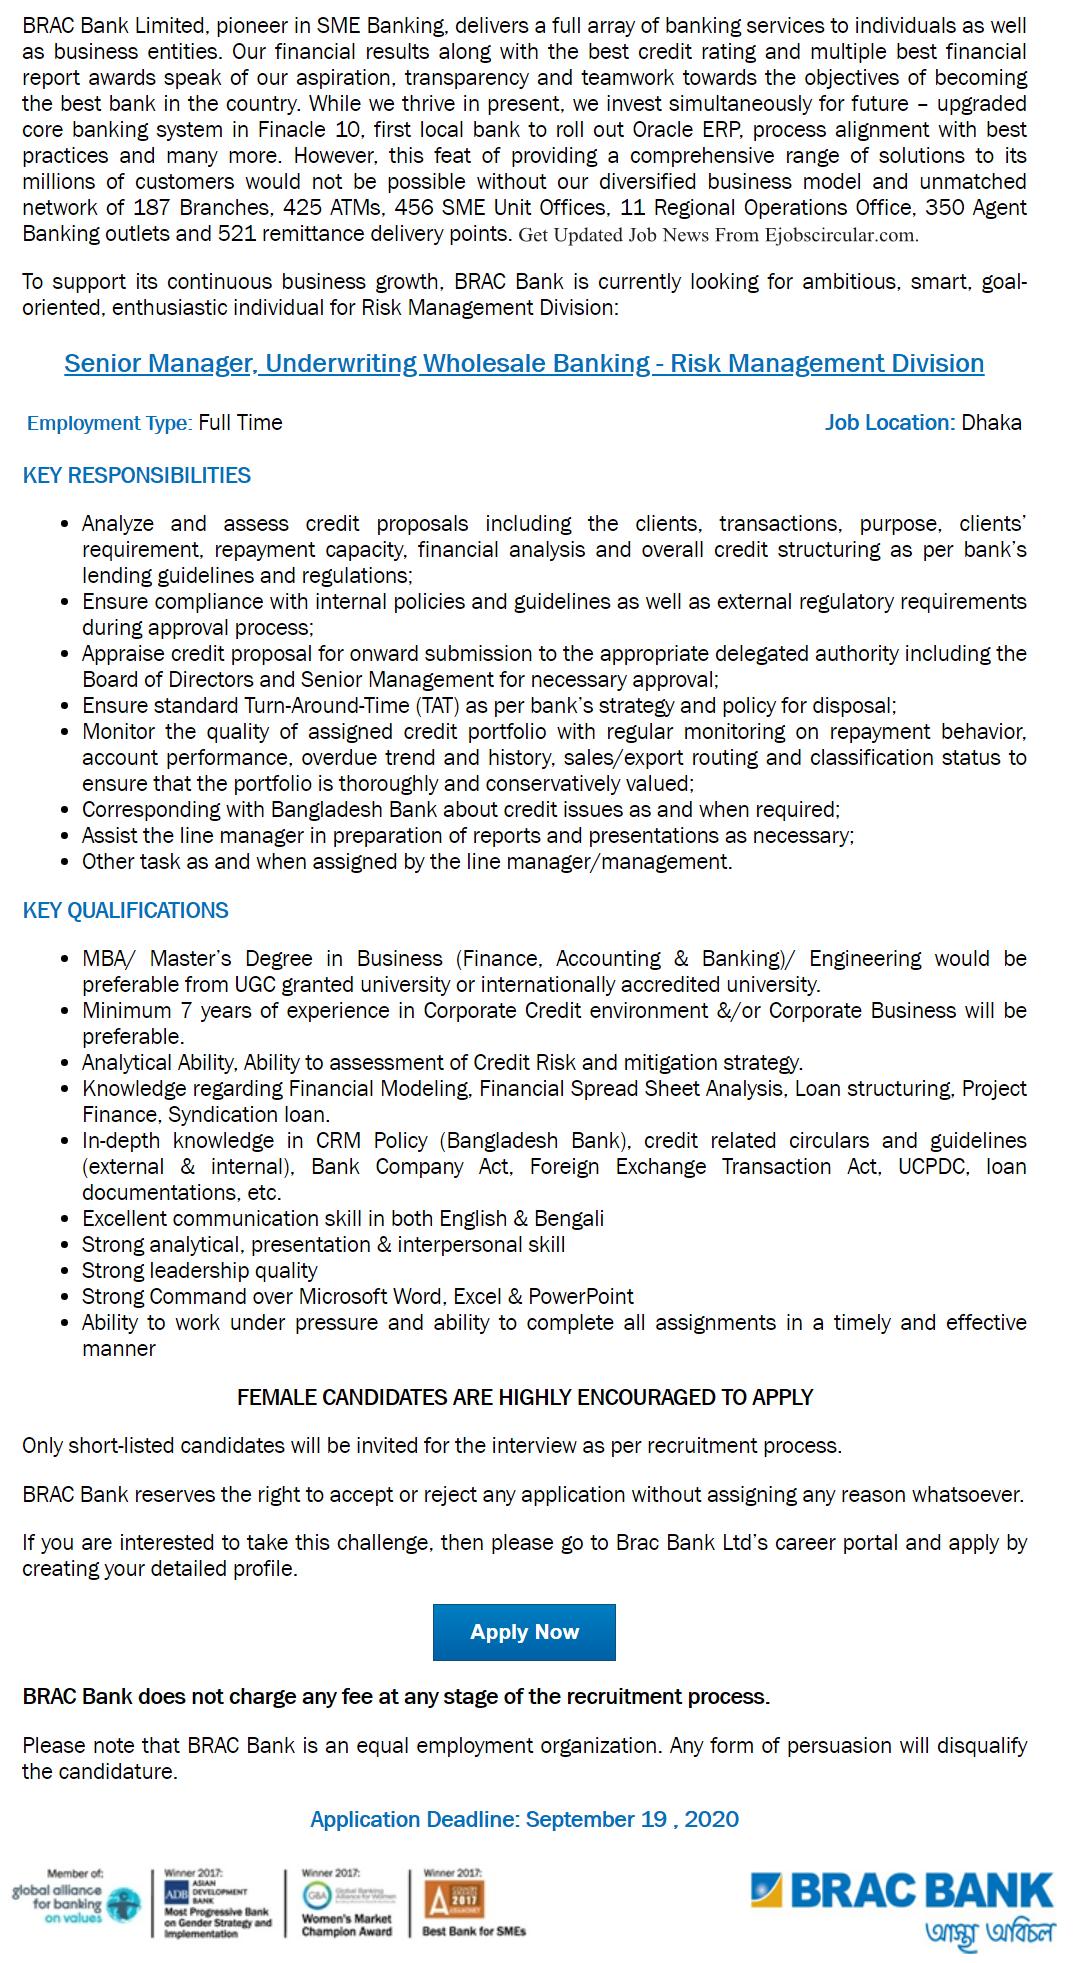 BRAC-Bank-Job-Circular-2020-Apply-Online